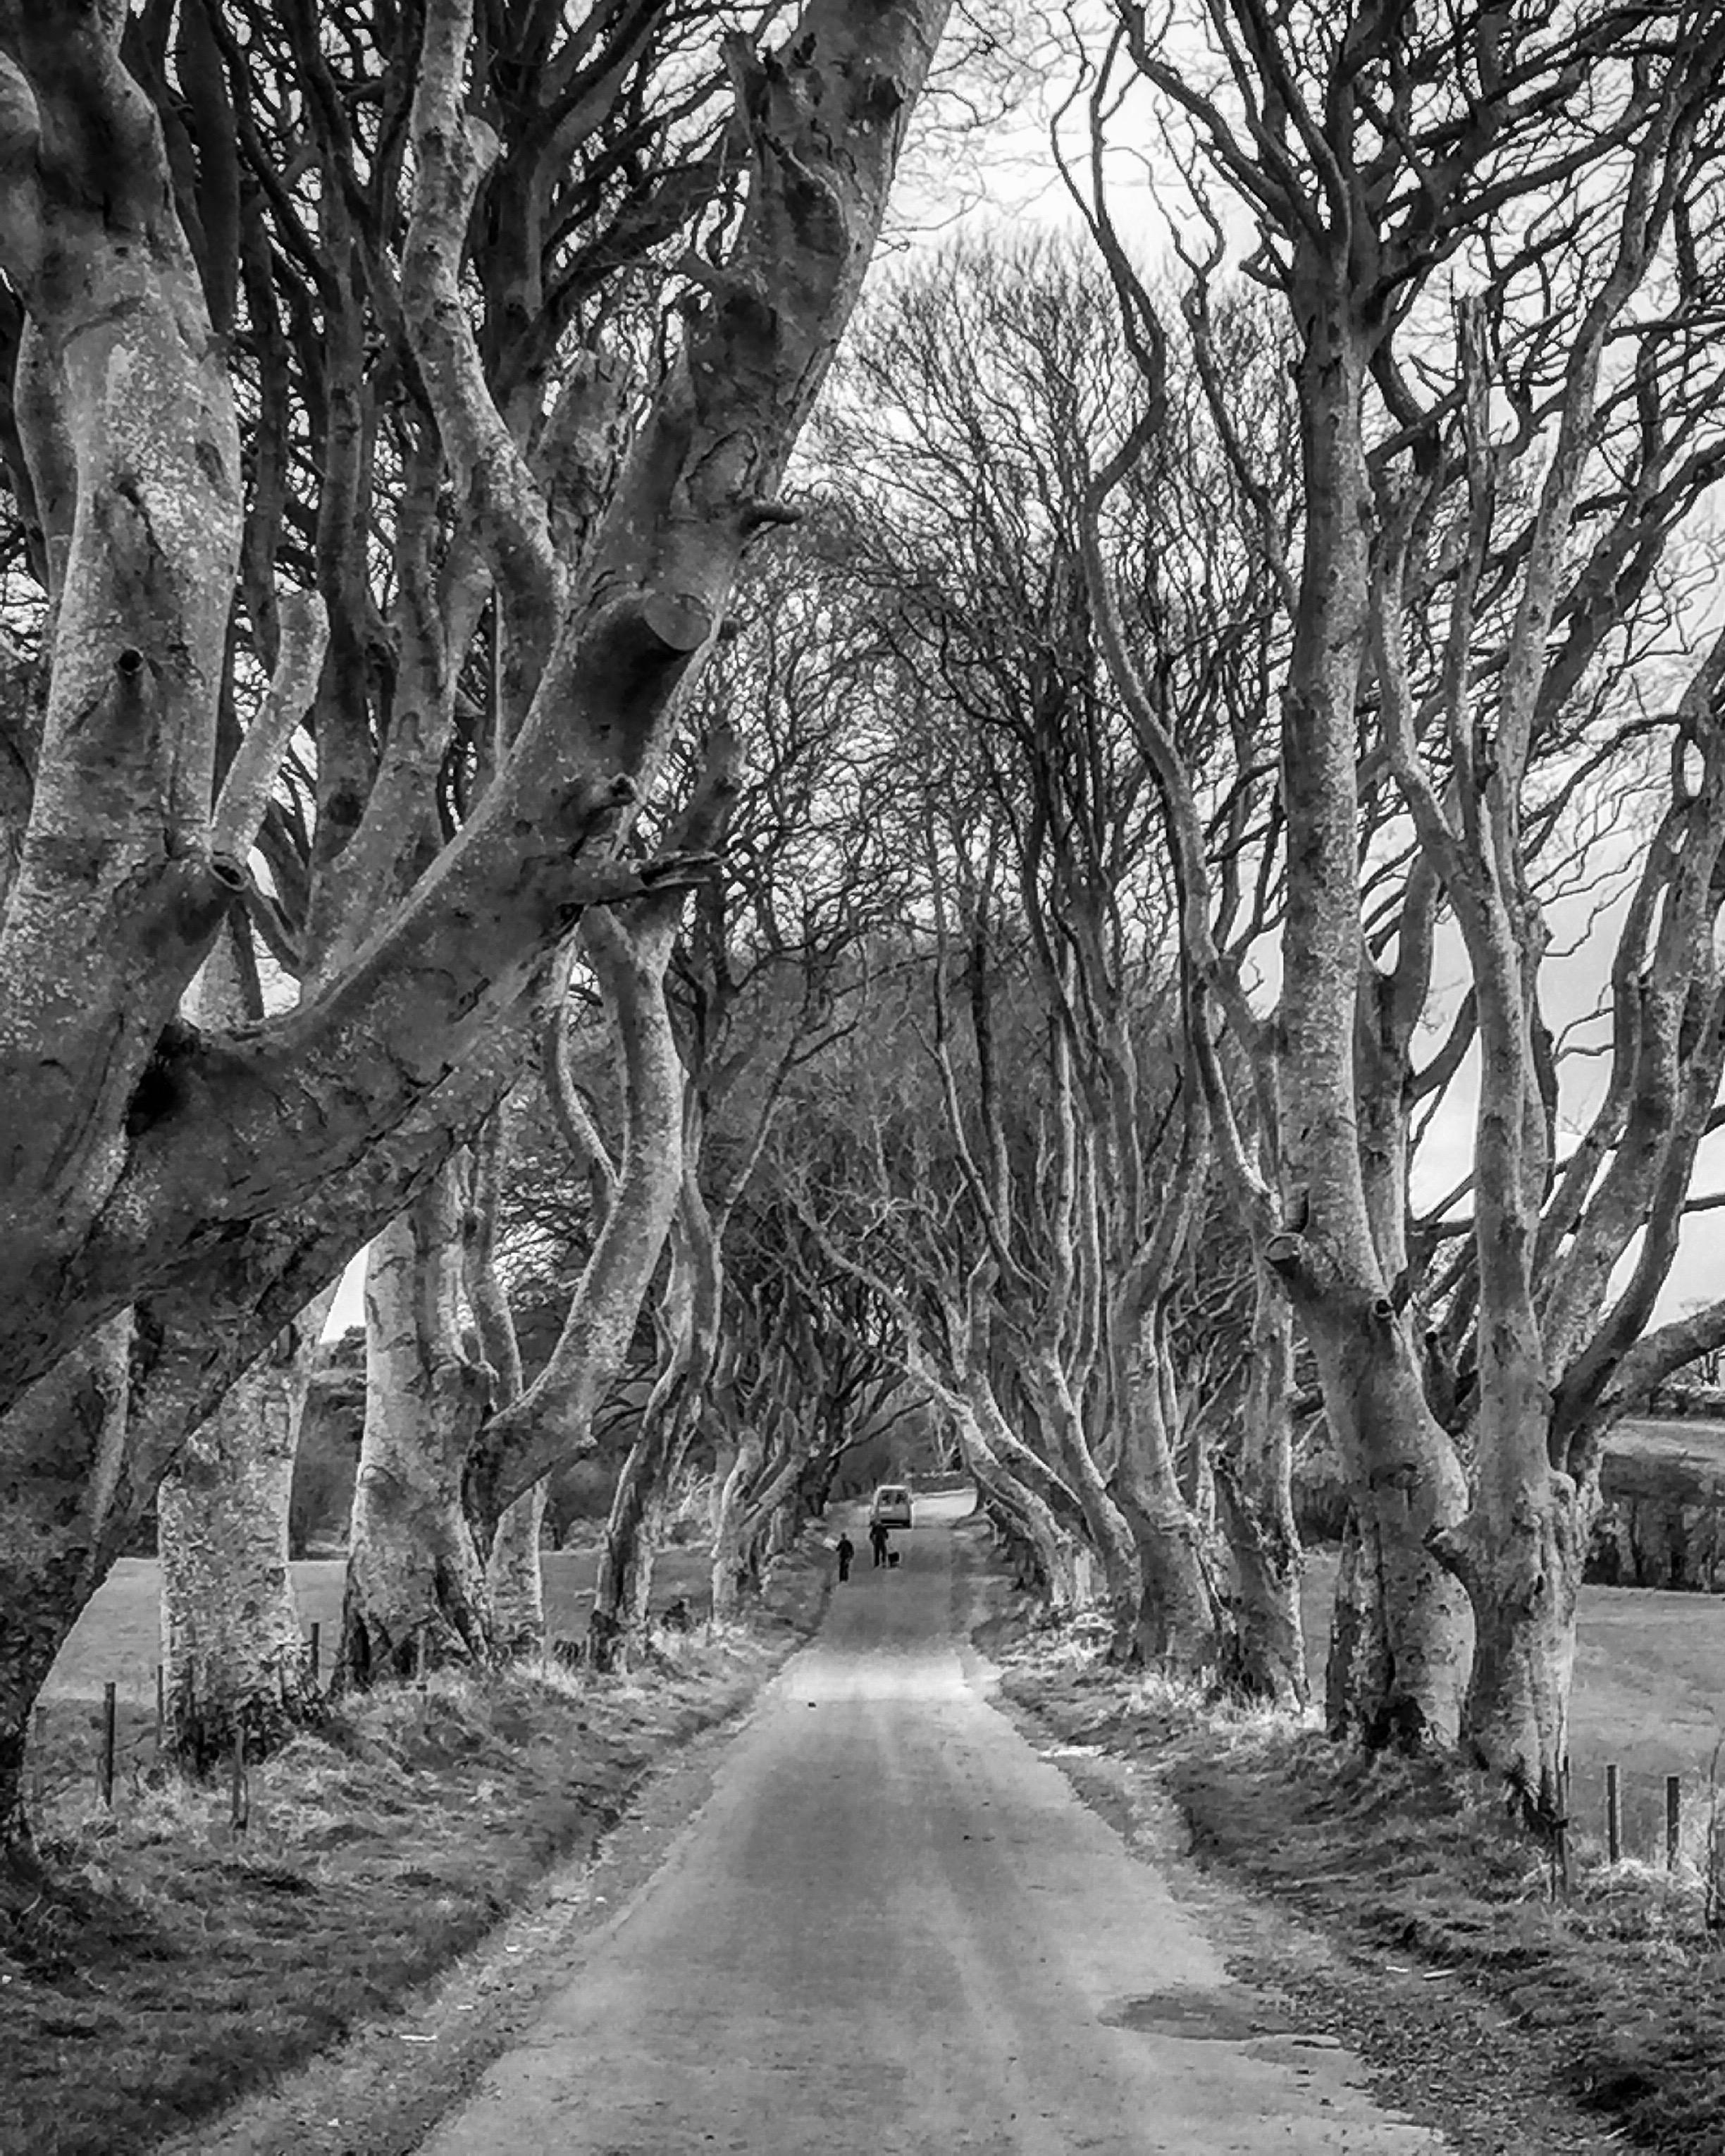 dark_hedges_antrim_roadtrip_ni_explorer_niexplorer_northern_ireland_blog.jpg